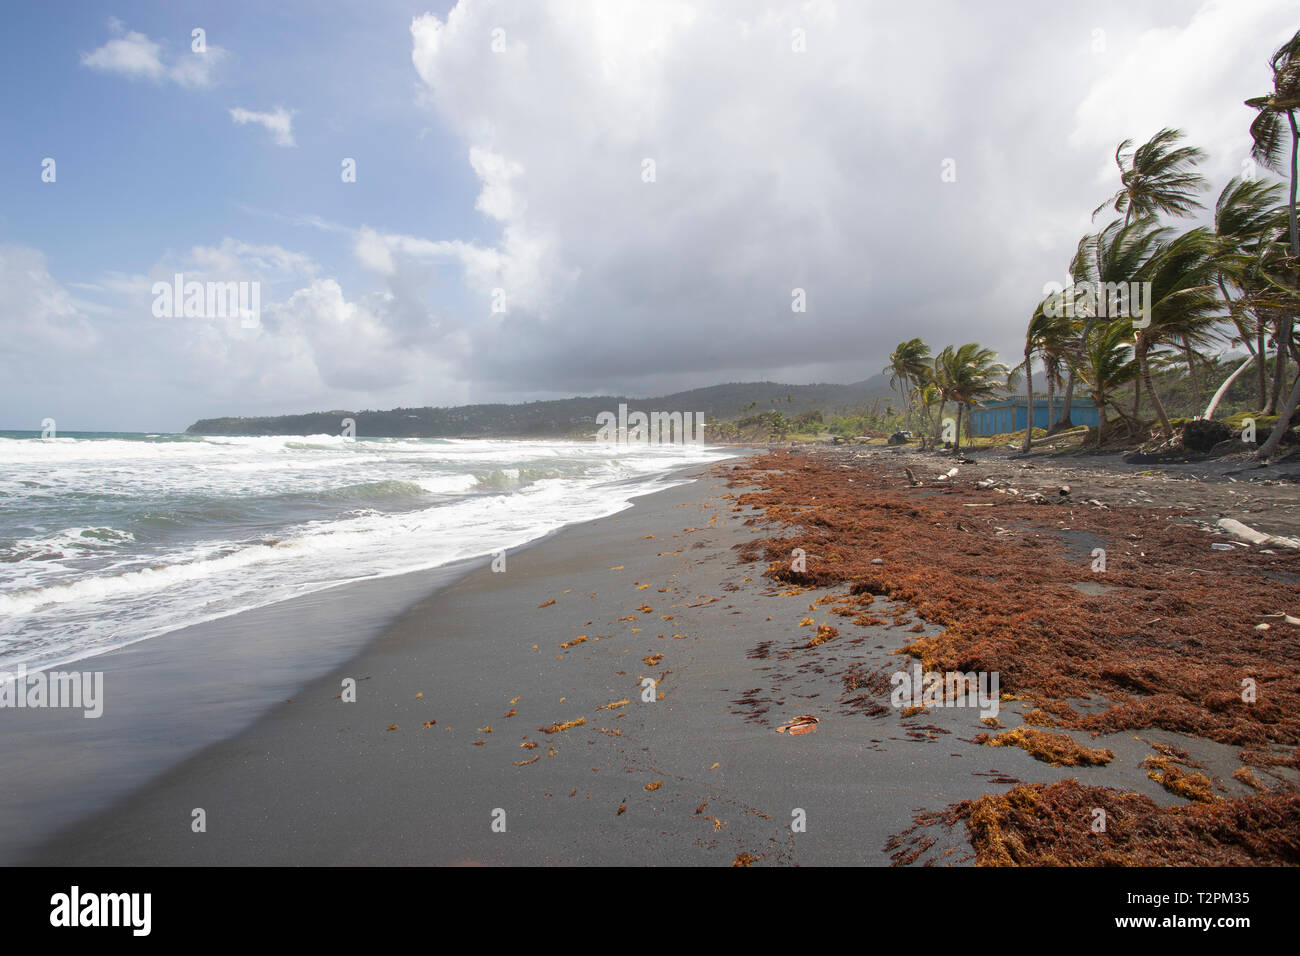 Coastal beach, Londonderry, Dominica, Caribbean - Stock Image